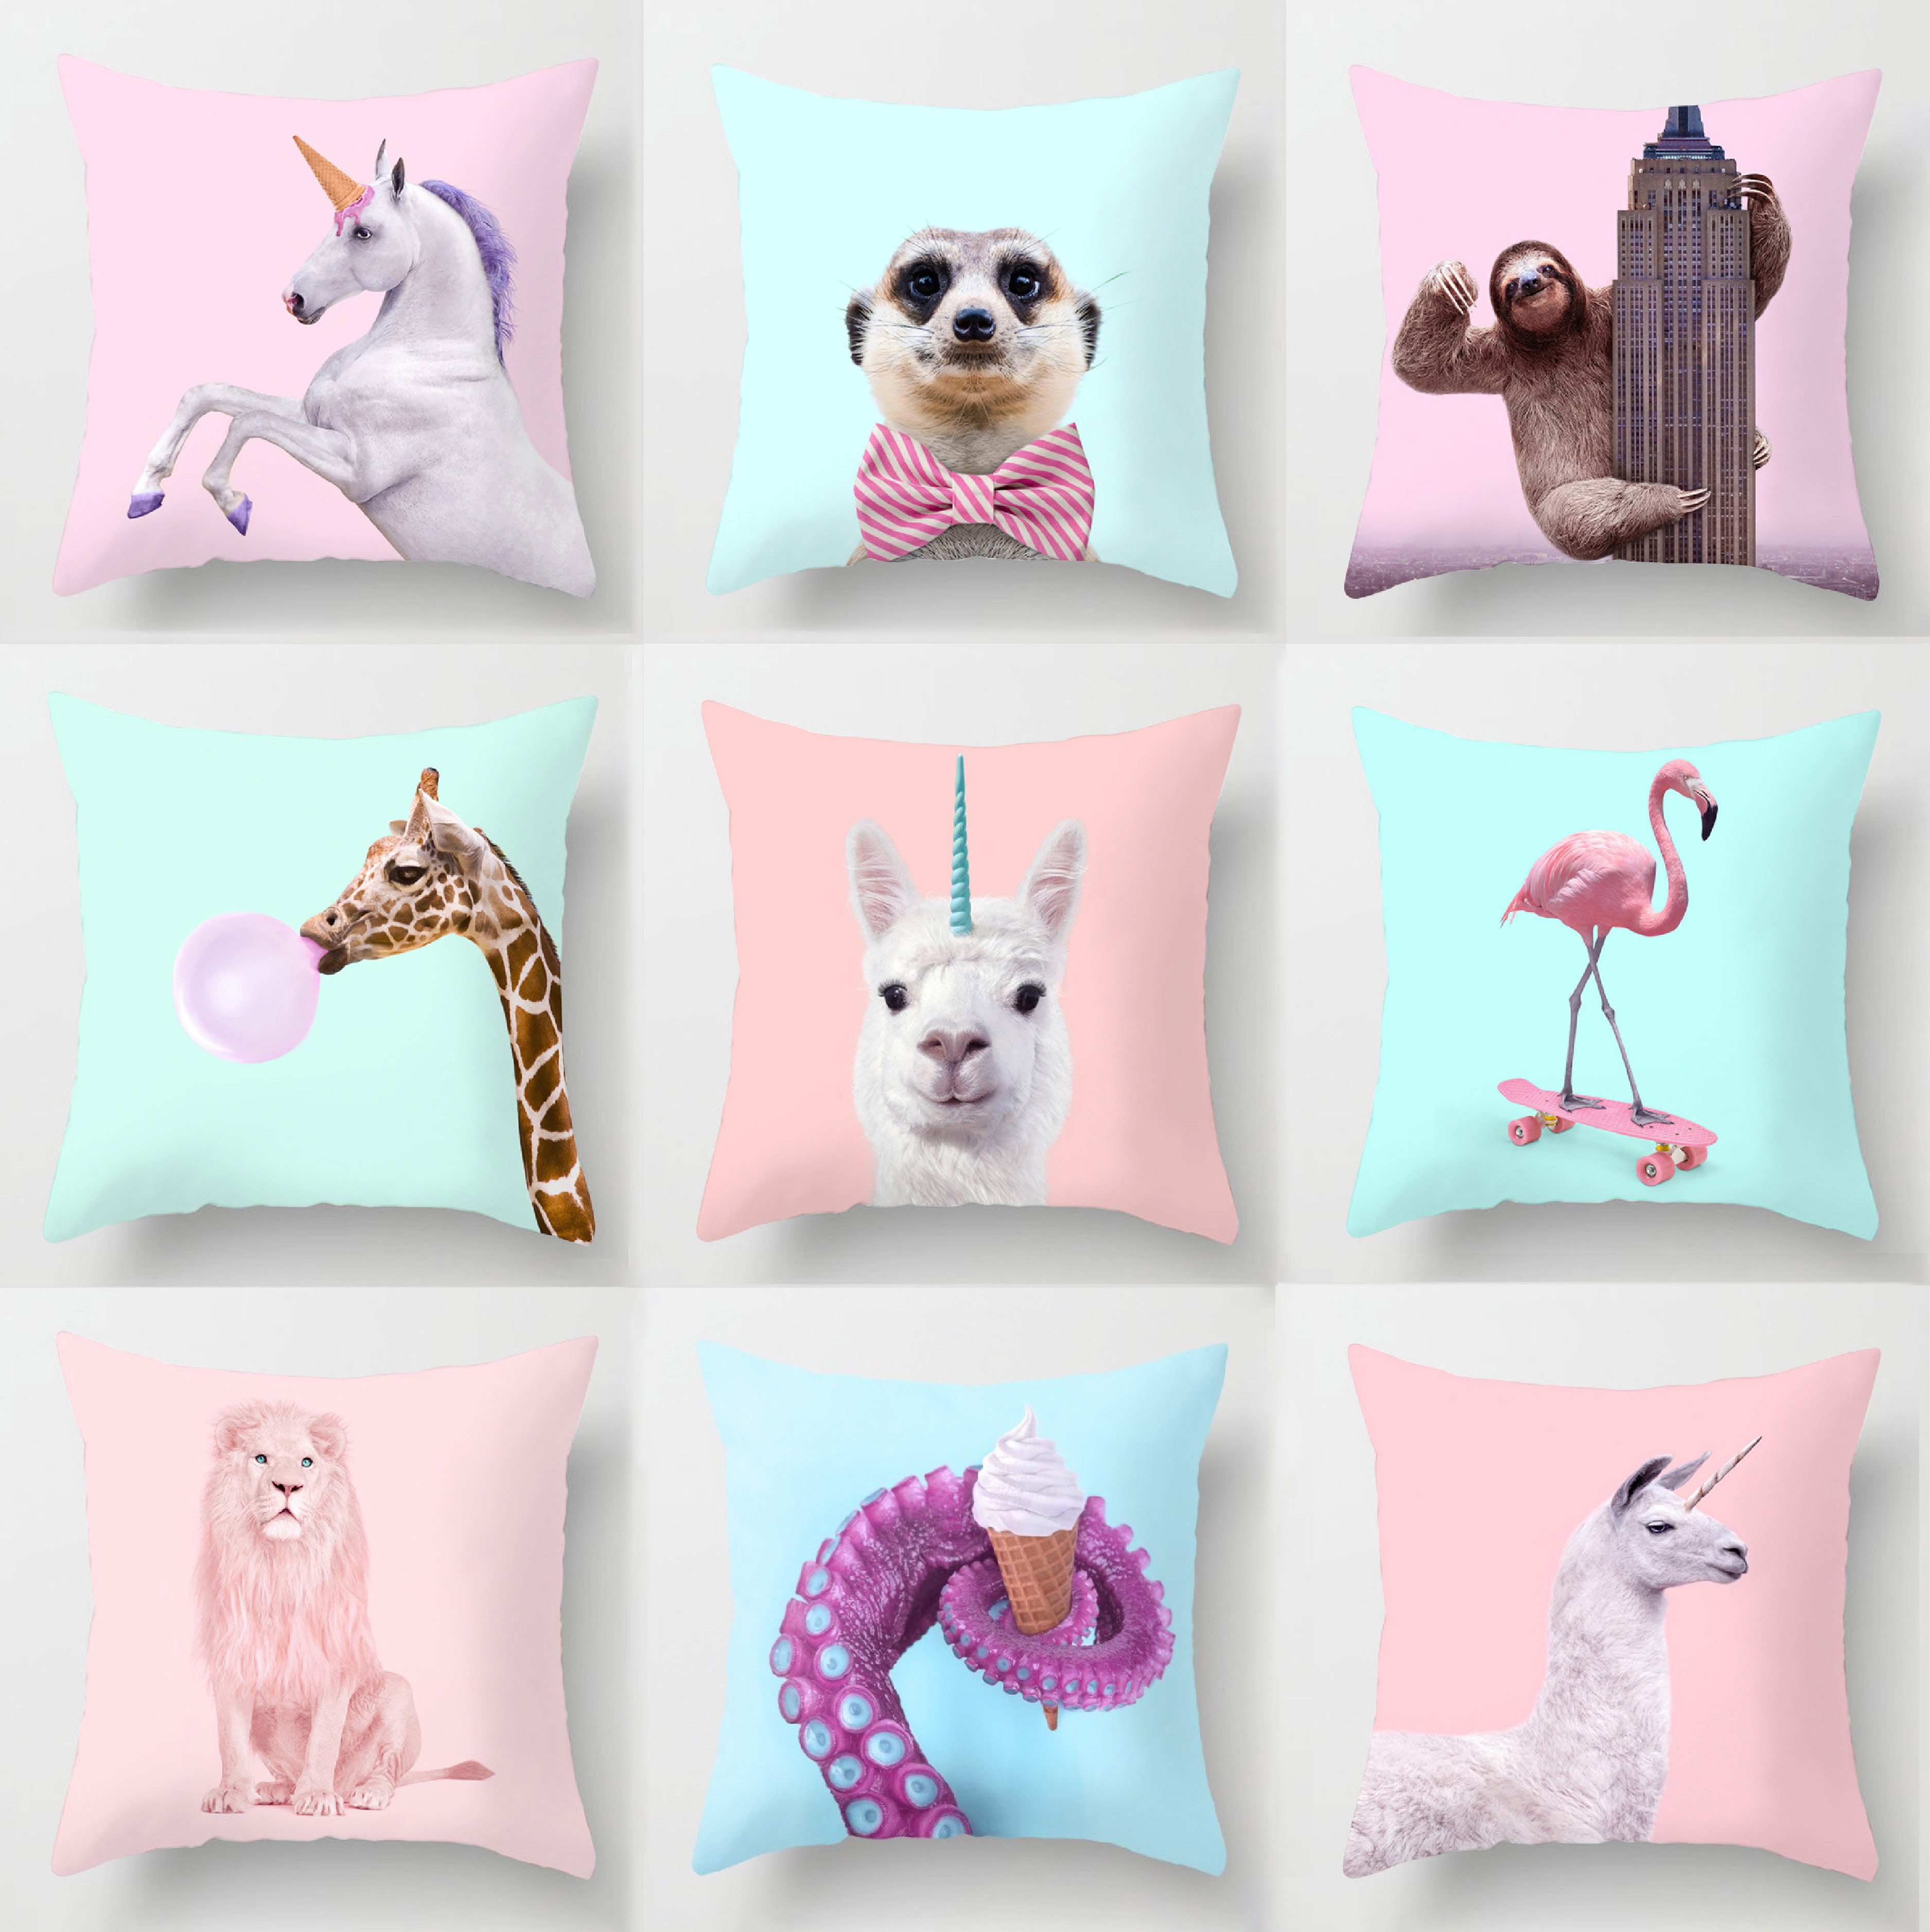 Cartoon Animal Printed Throw Pillows Cushion Cover Decorative Dog Flamingo Unicorn Giraffe Elephant Home Decoration Accessories